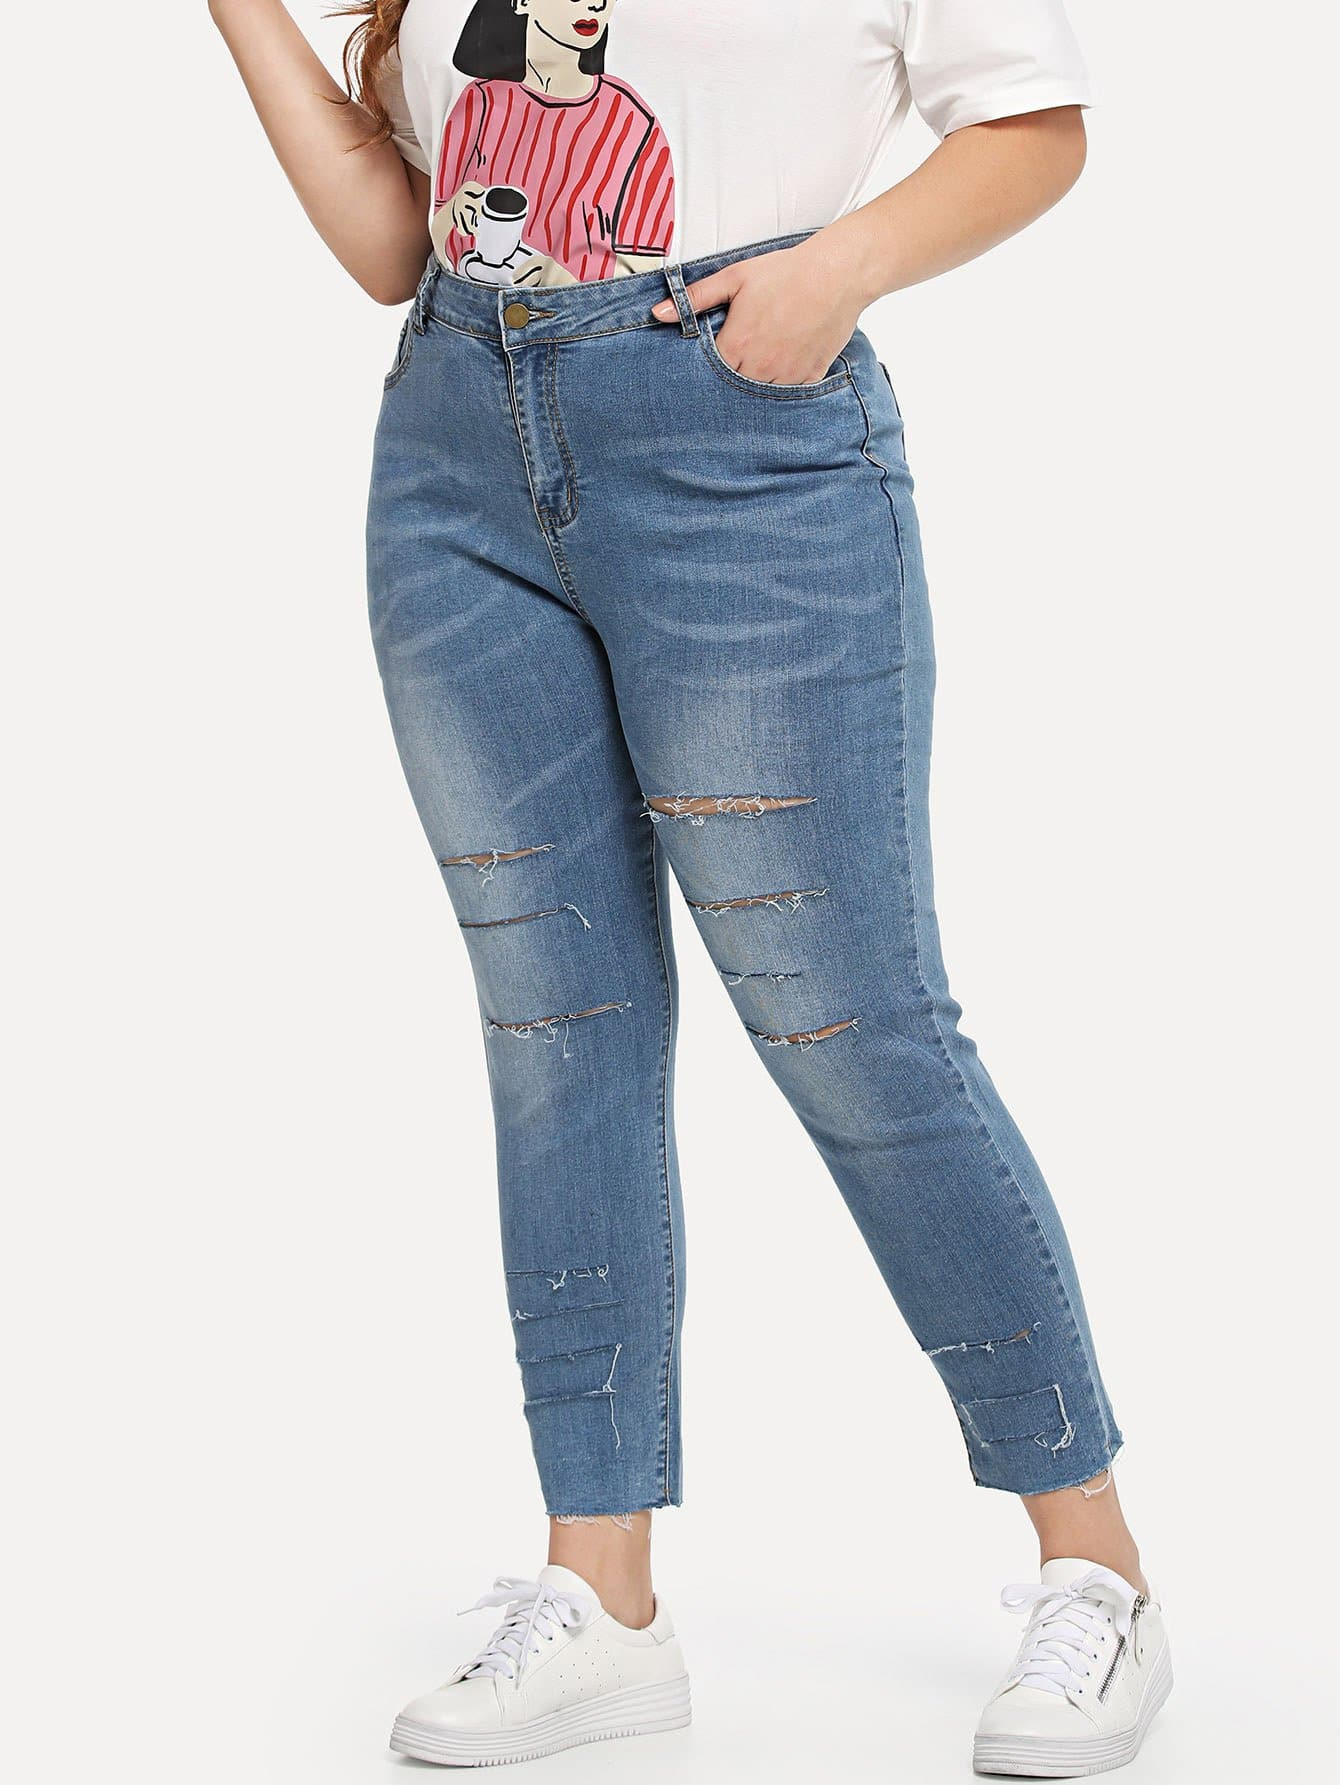 Plus Bleach Wash Rips Detail Jeans bleach wash destroyed jeans